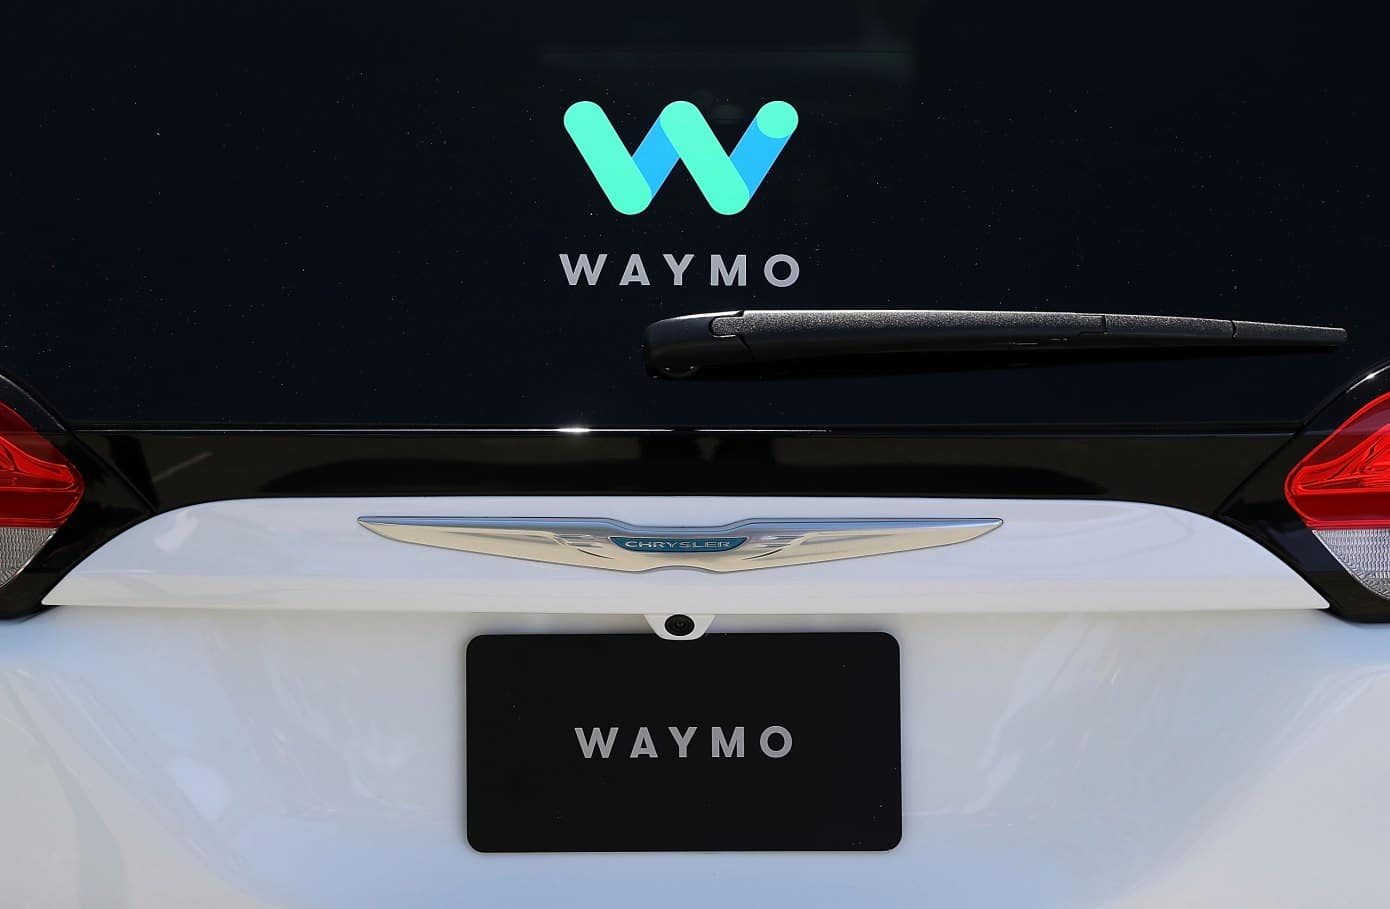 aventura-cjdr-waymo-2019-fiat-chrysler-updates